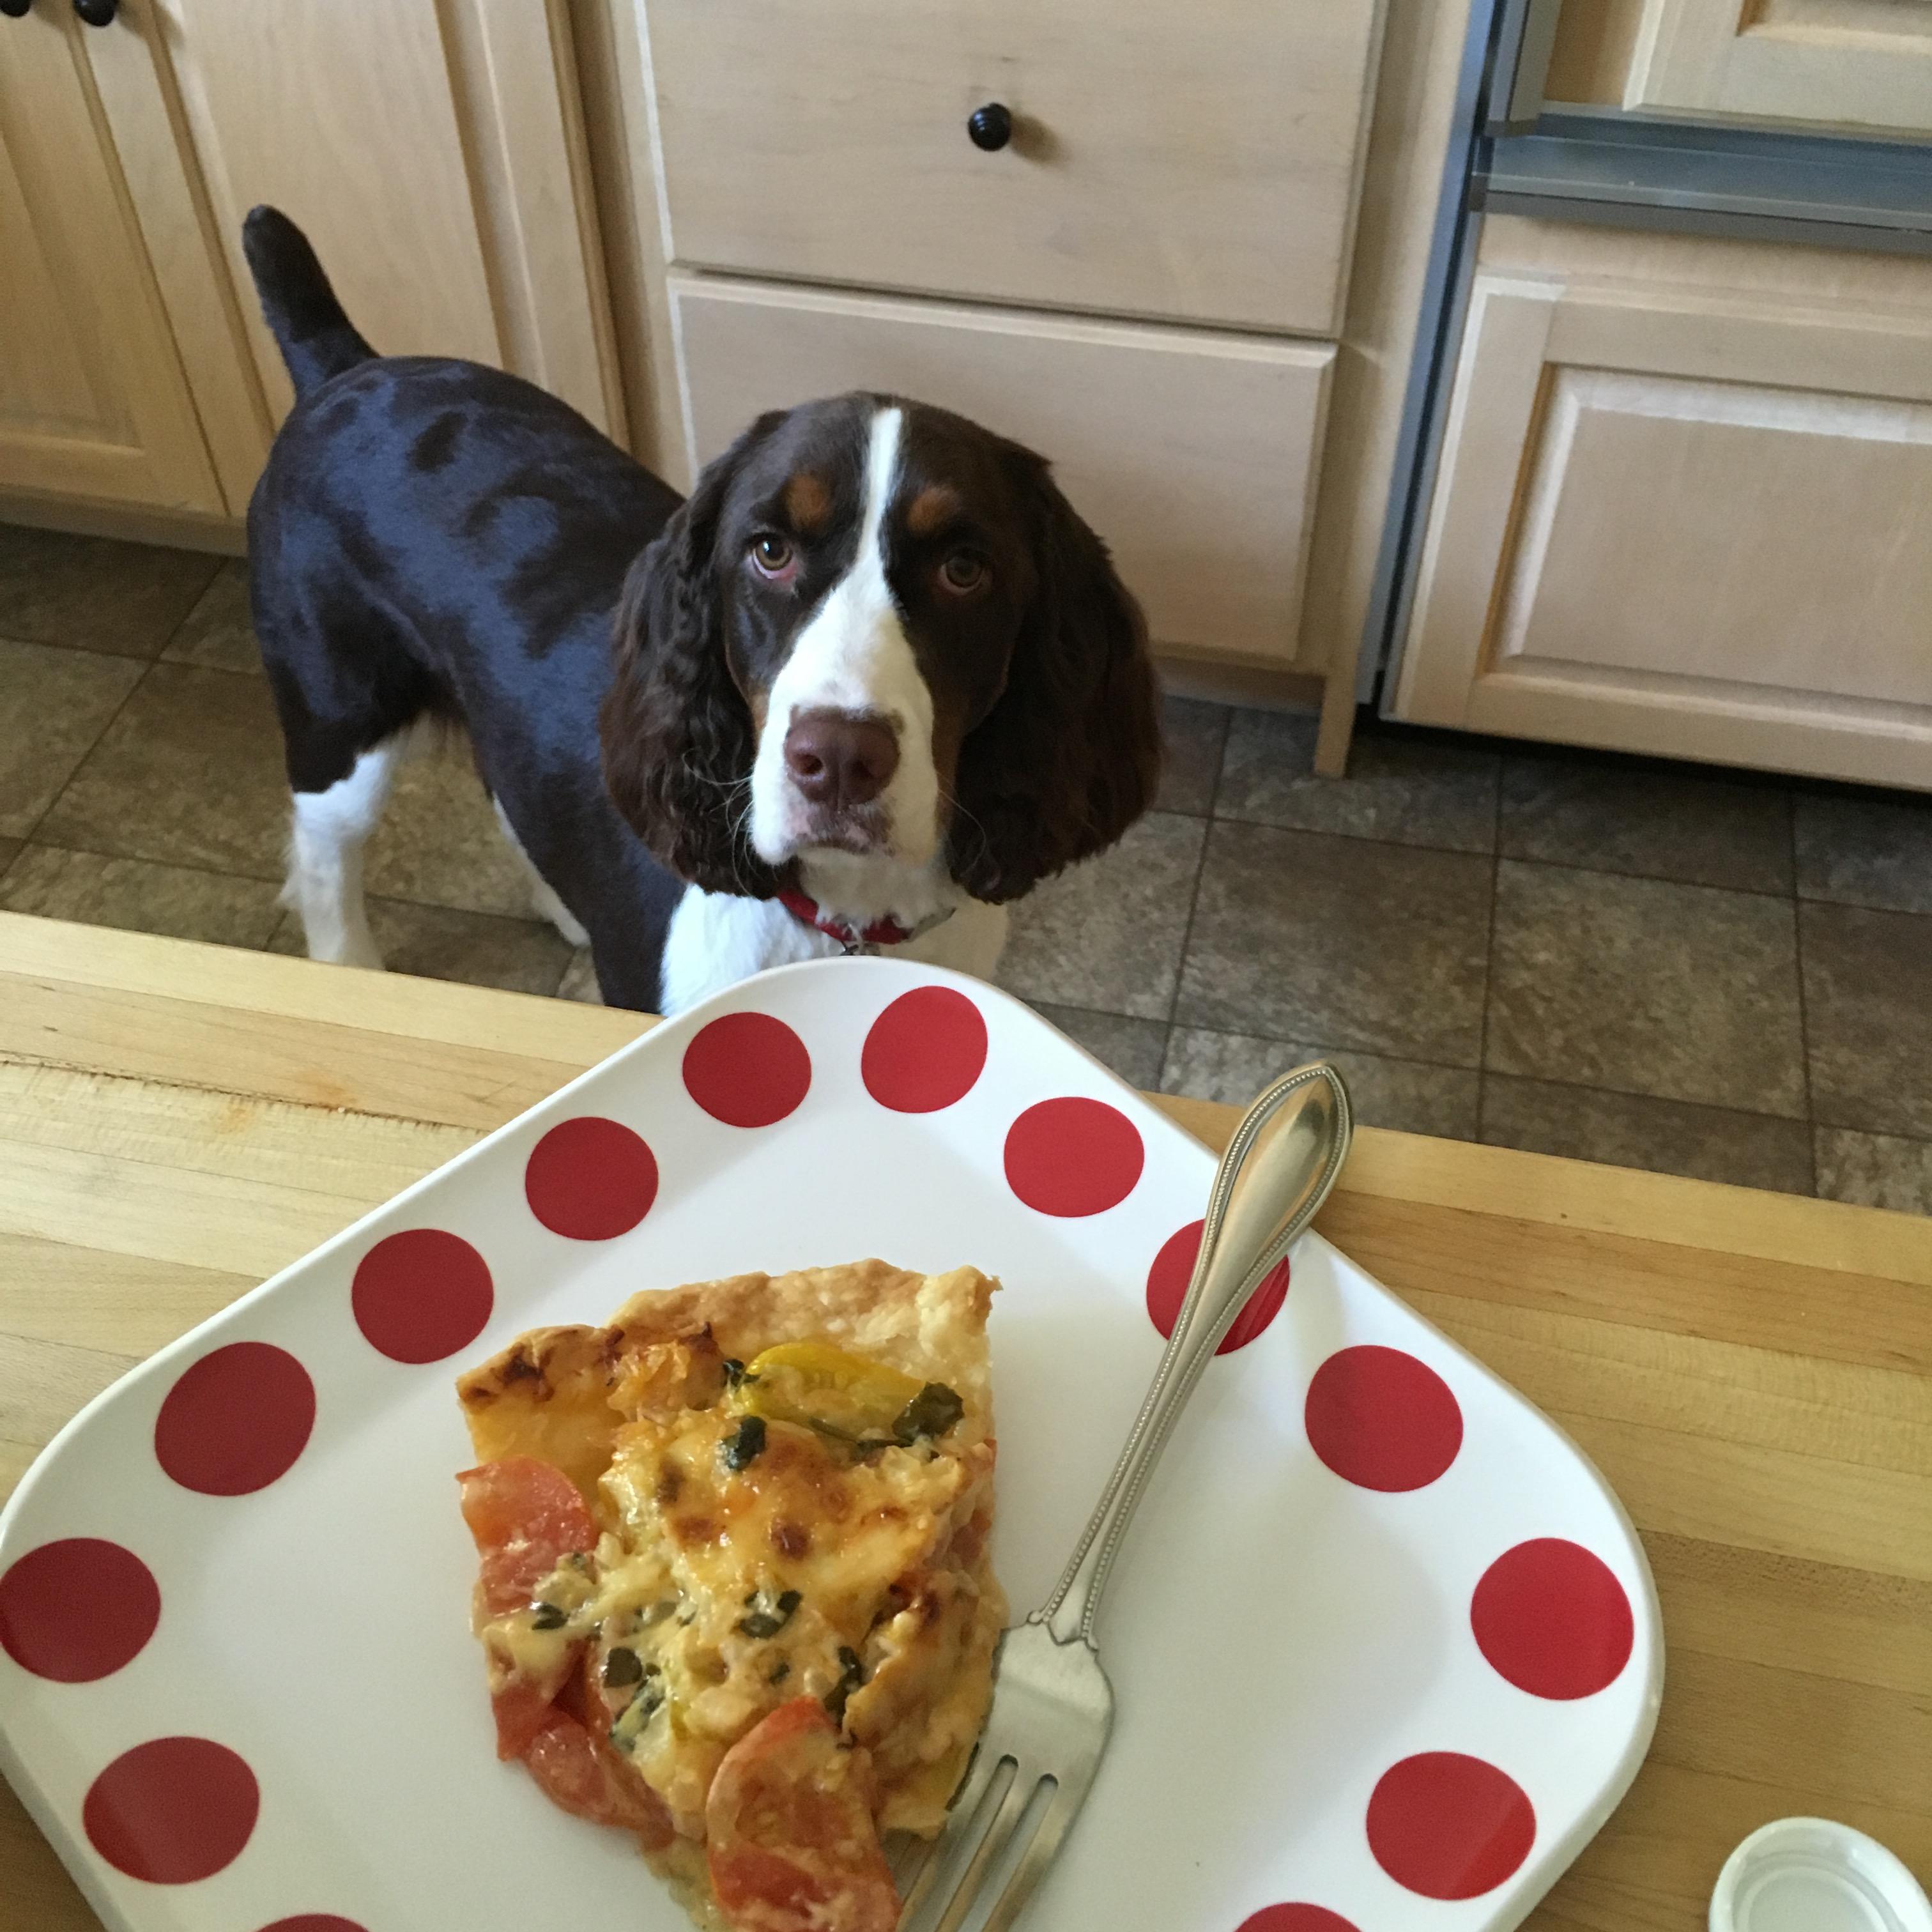 slice of tomato pie and dog